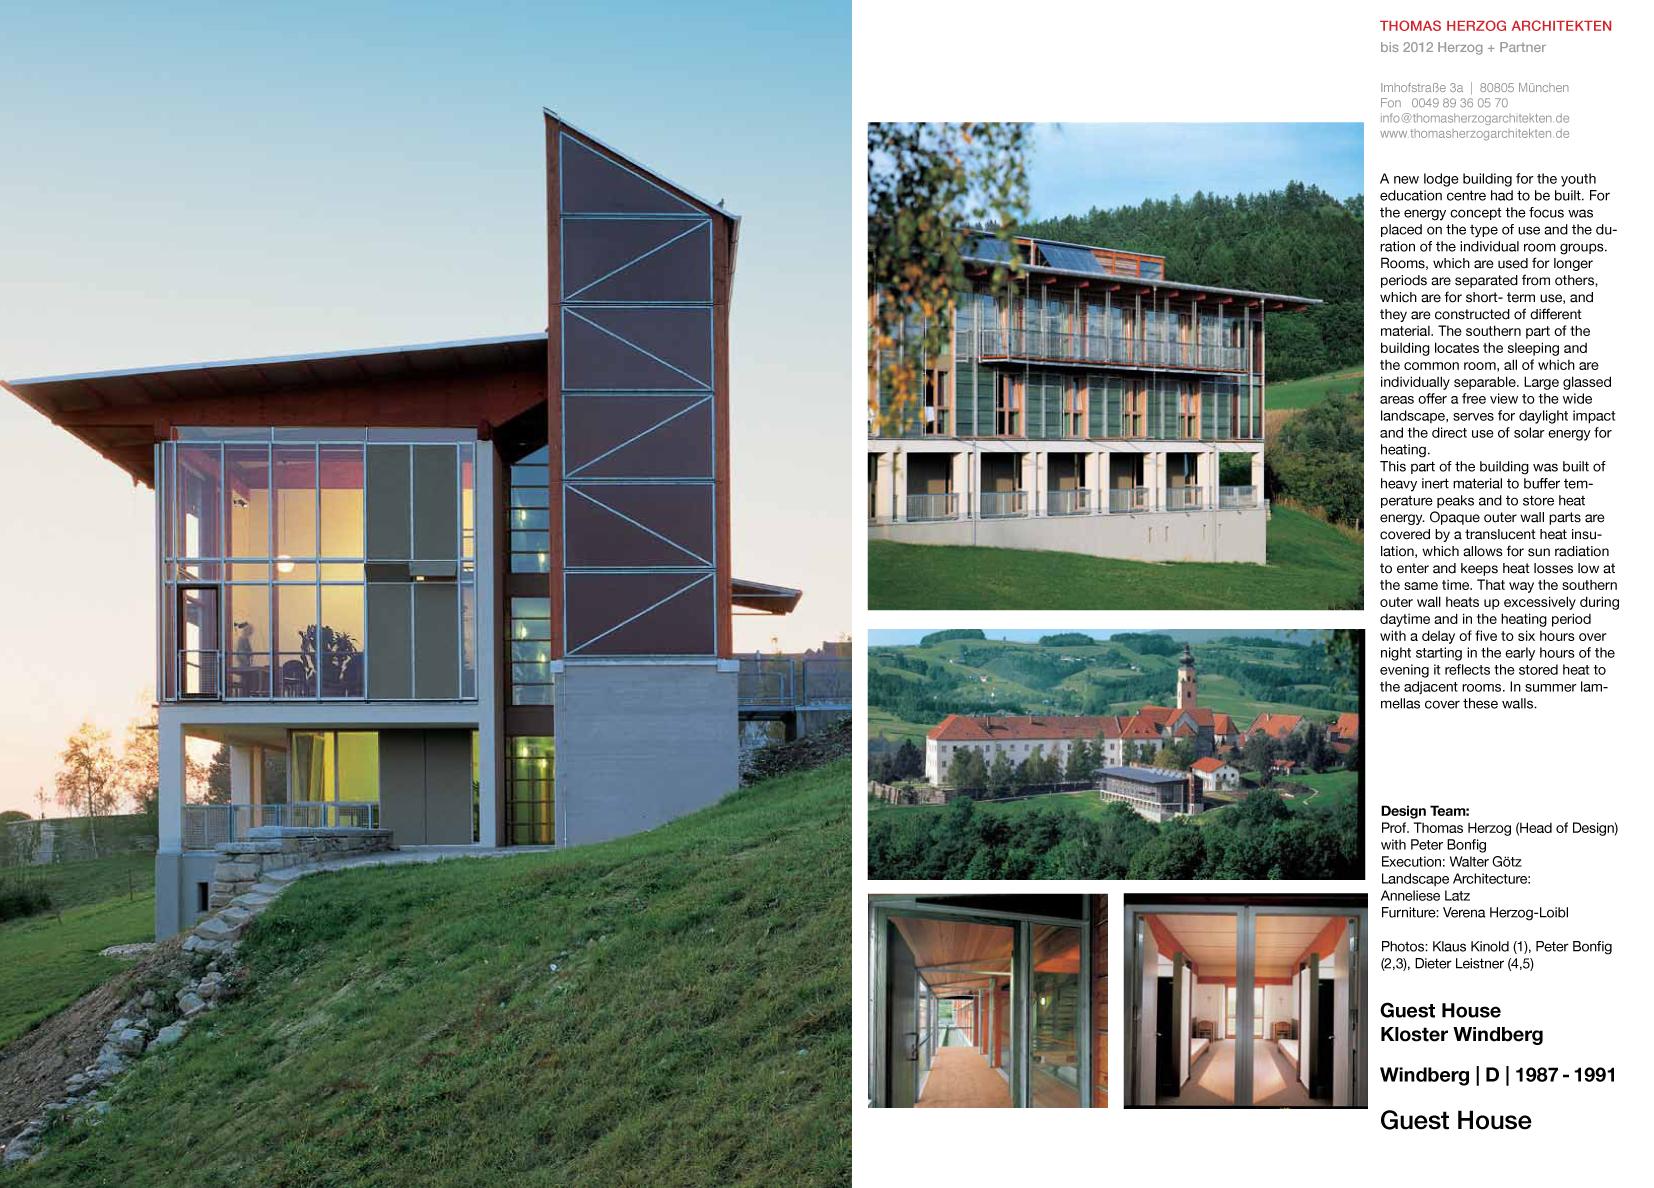 Guest House Kloster Windberg DE 1991